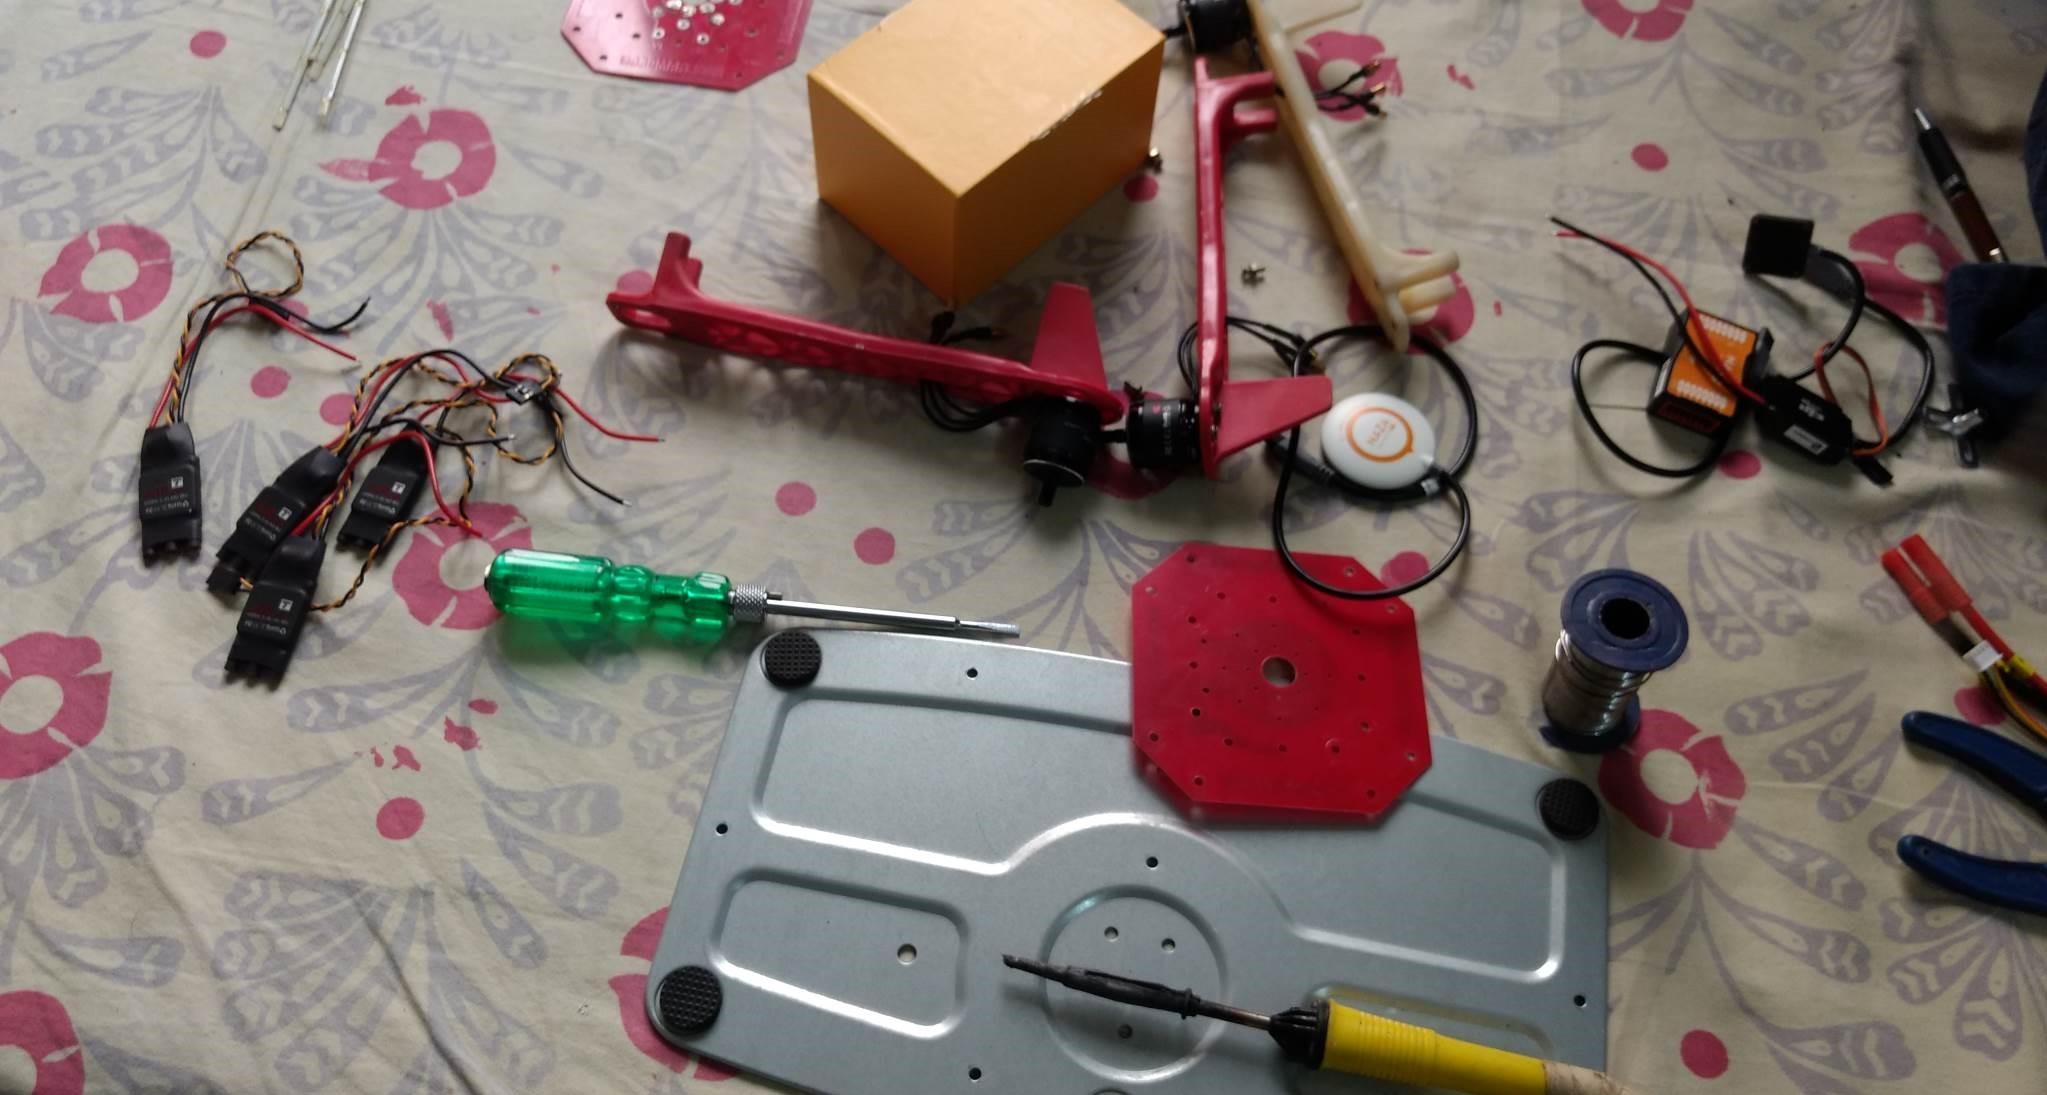 Assembling a Quadcopter Frame